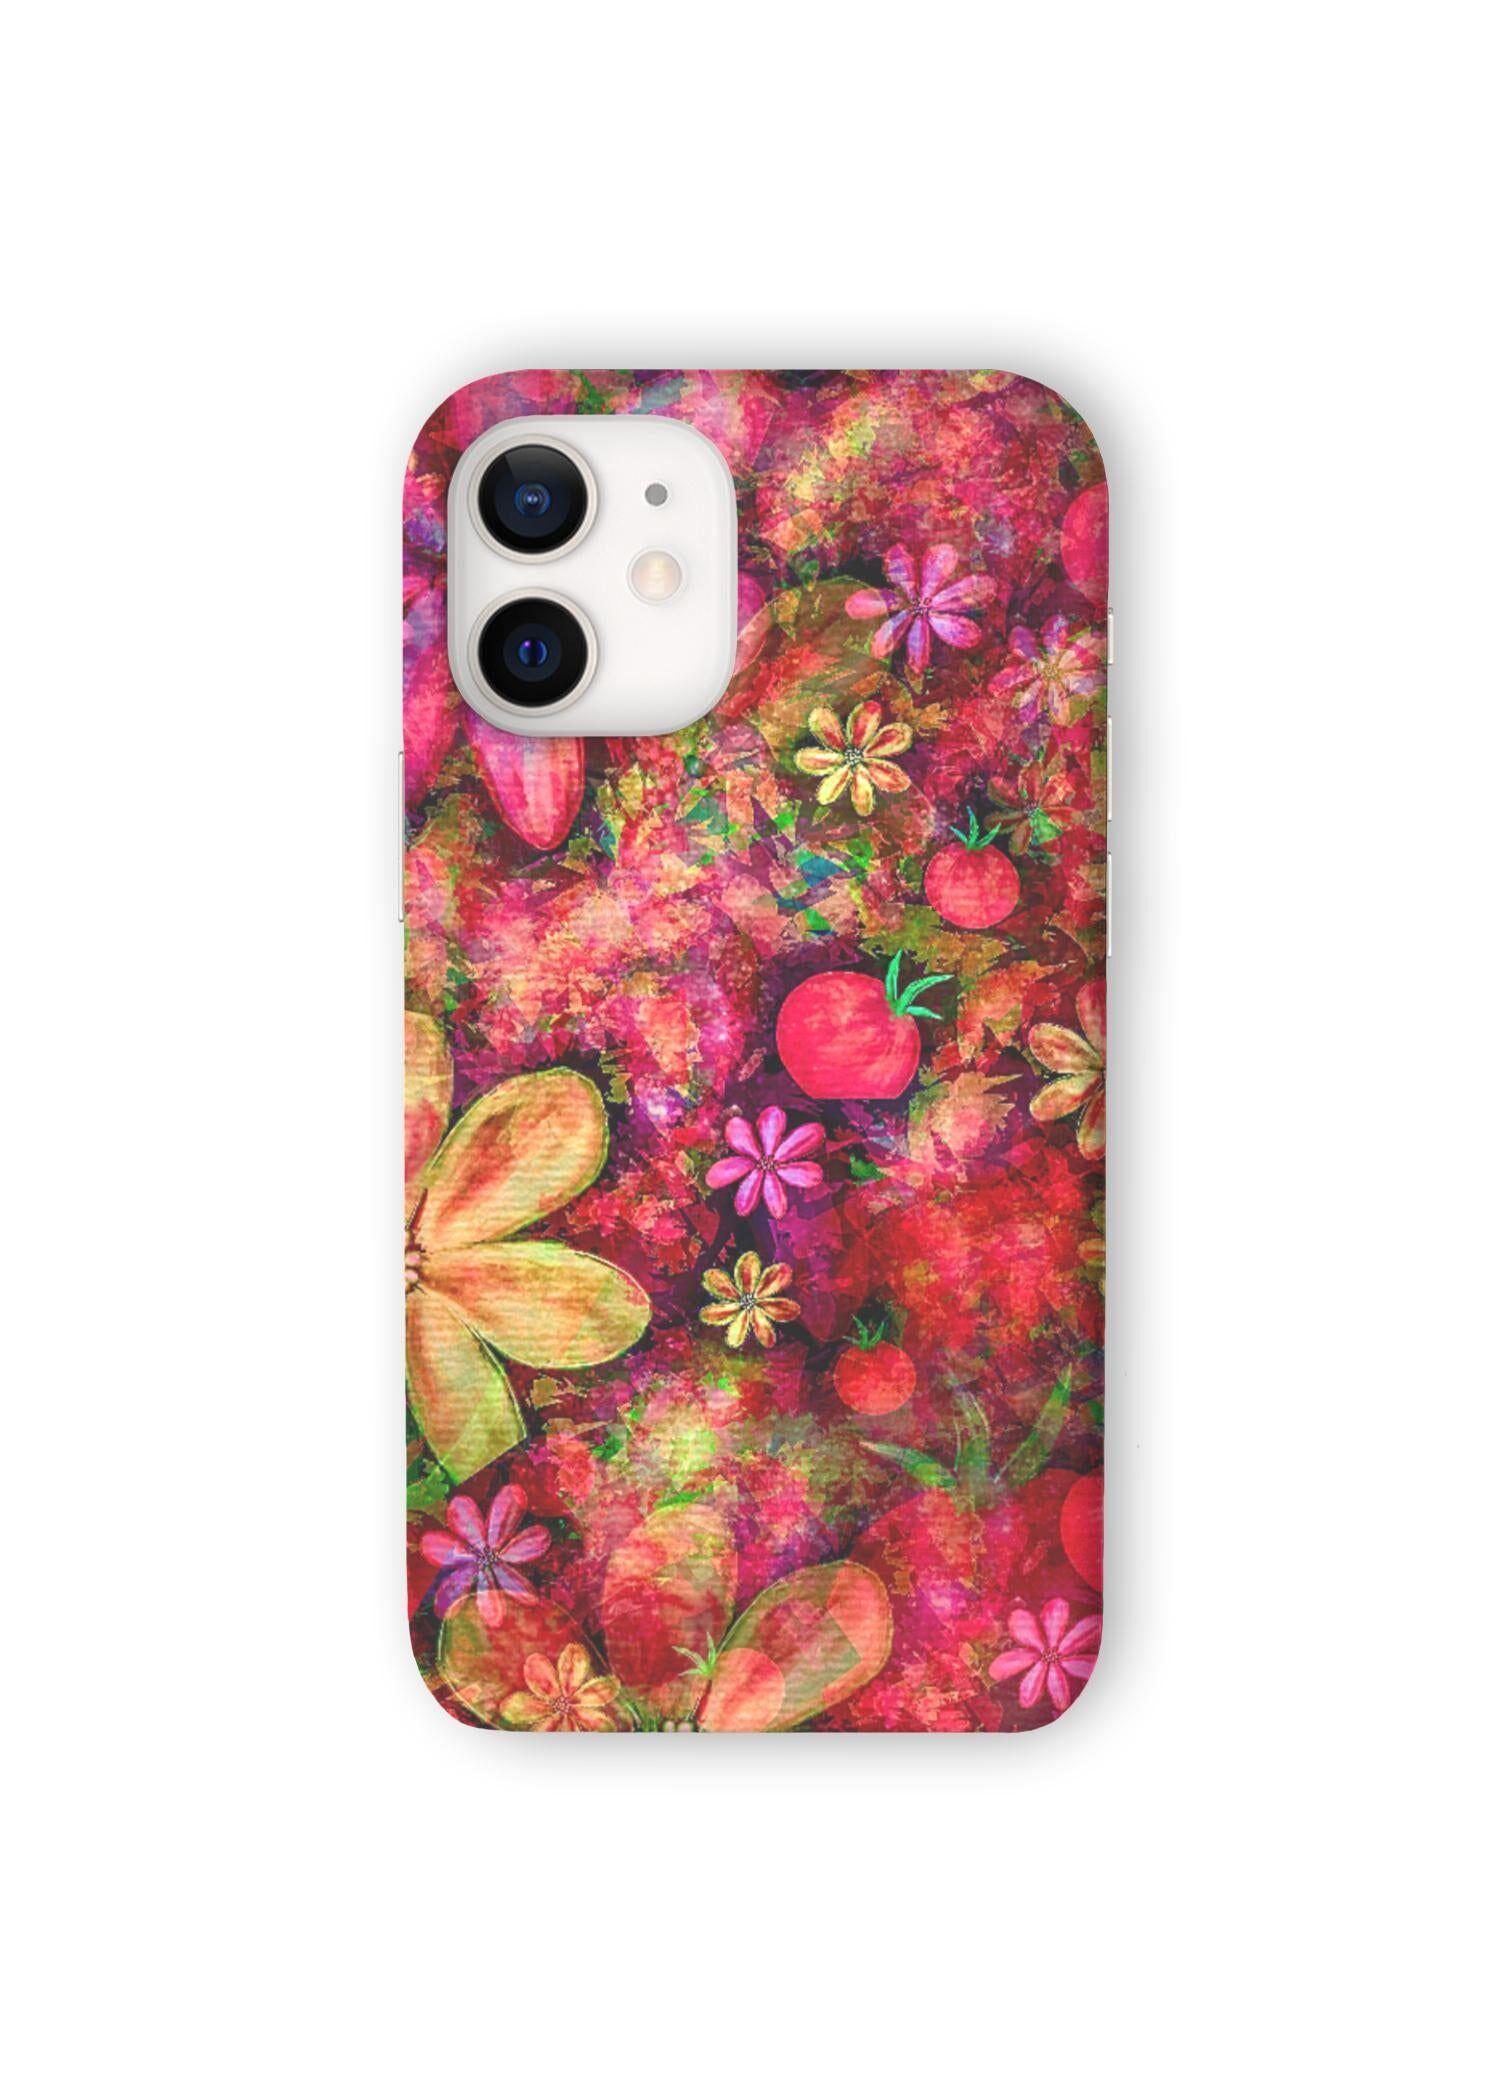 VIDA iPhone Case - Garden Collage by VIDA Original Artist  - Size: iPhone 12 Mini / Ultraslim